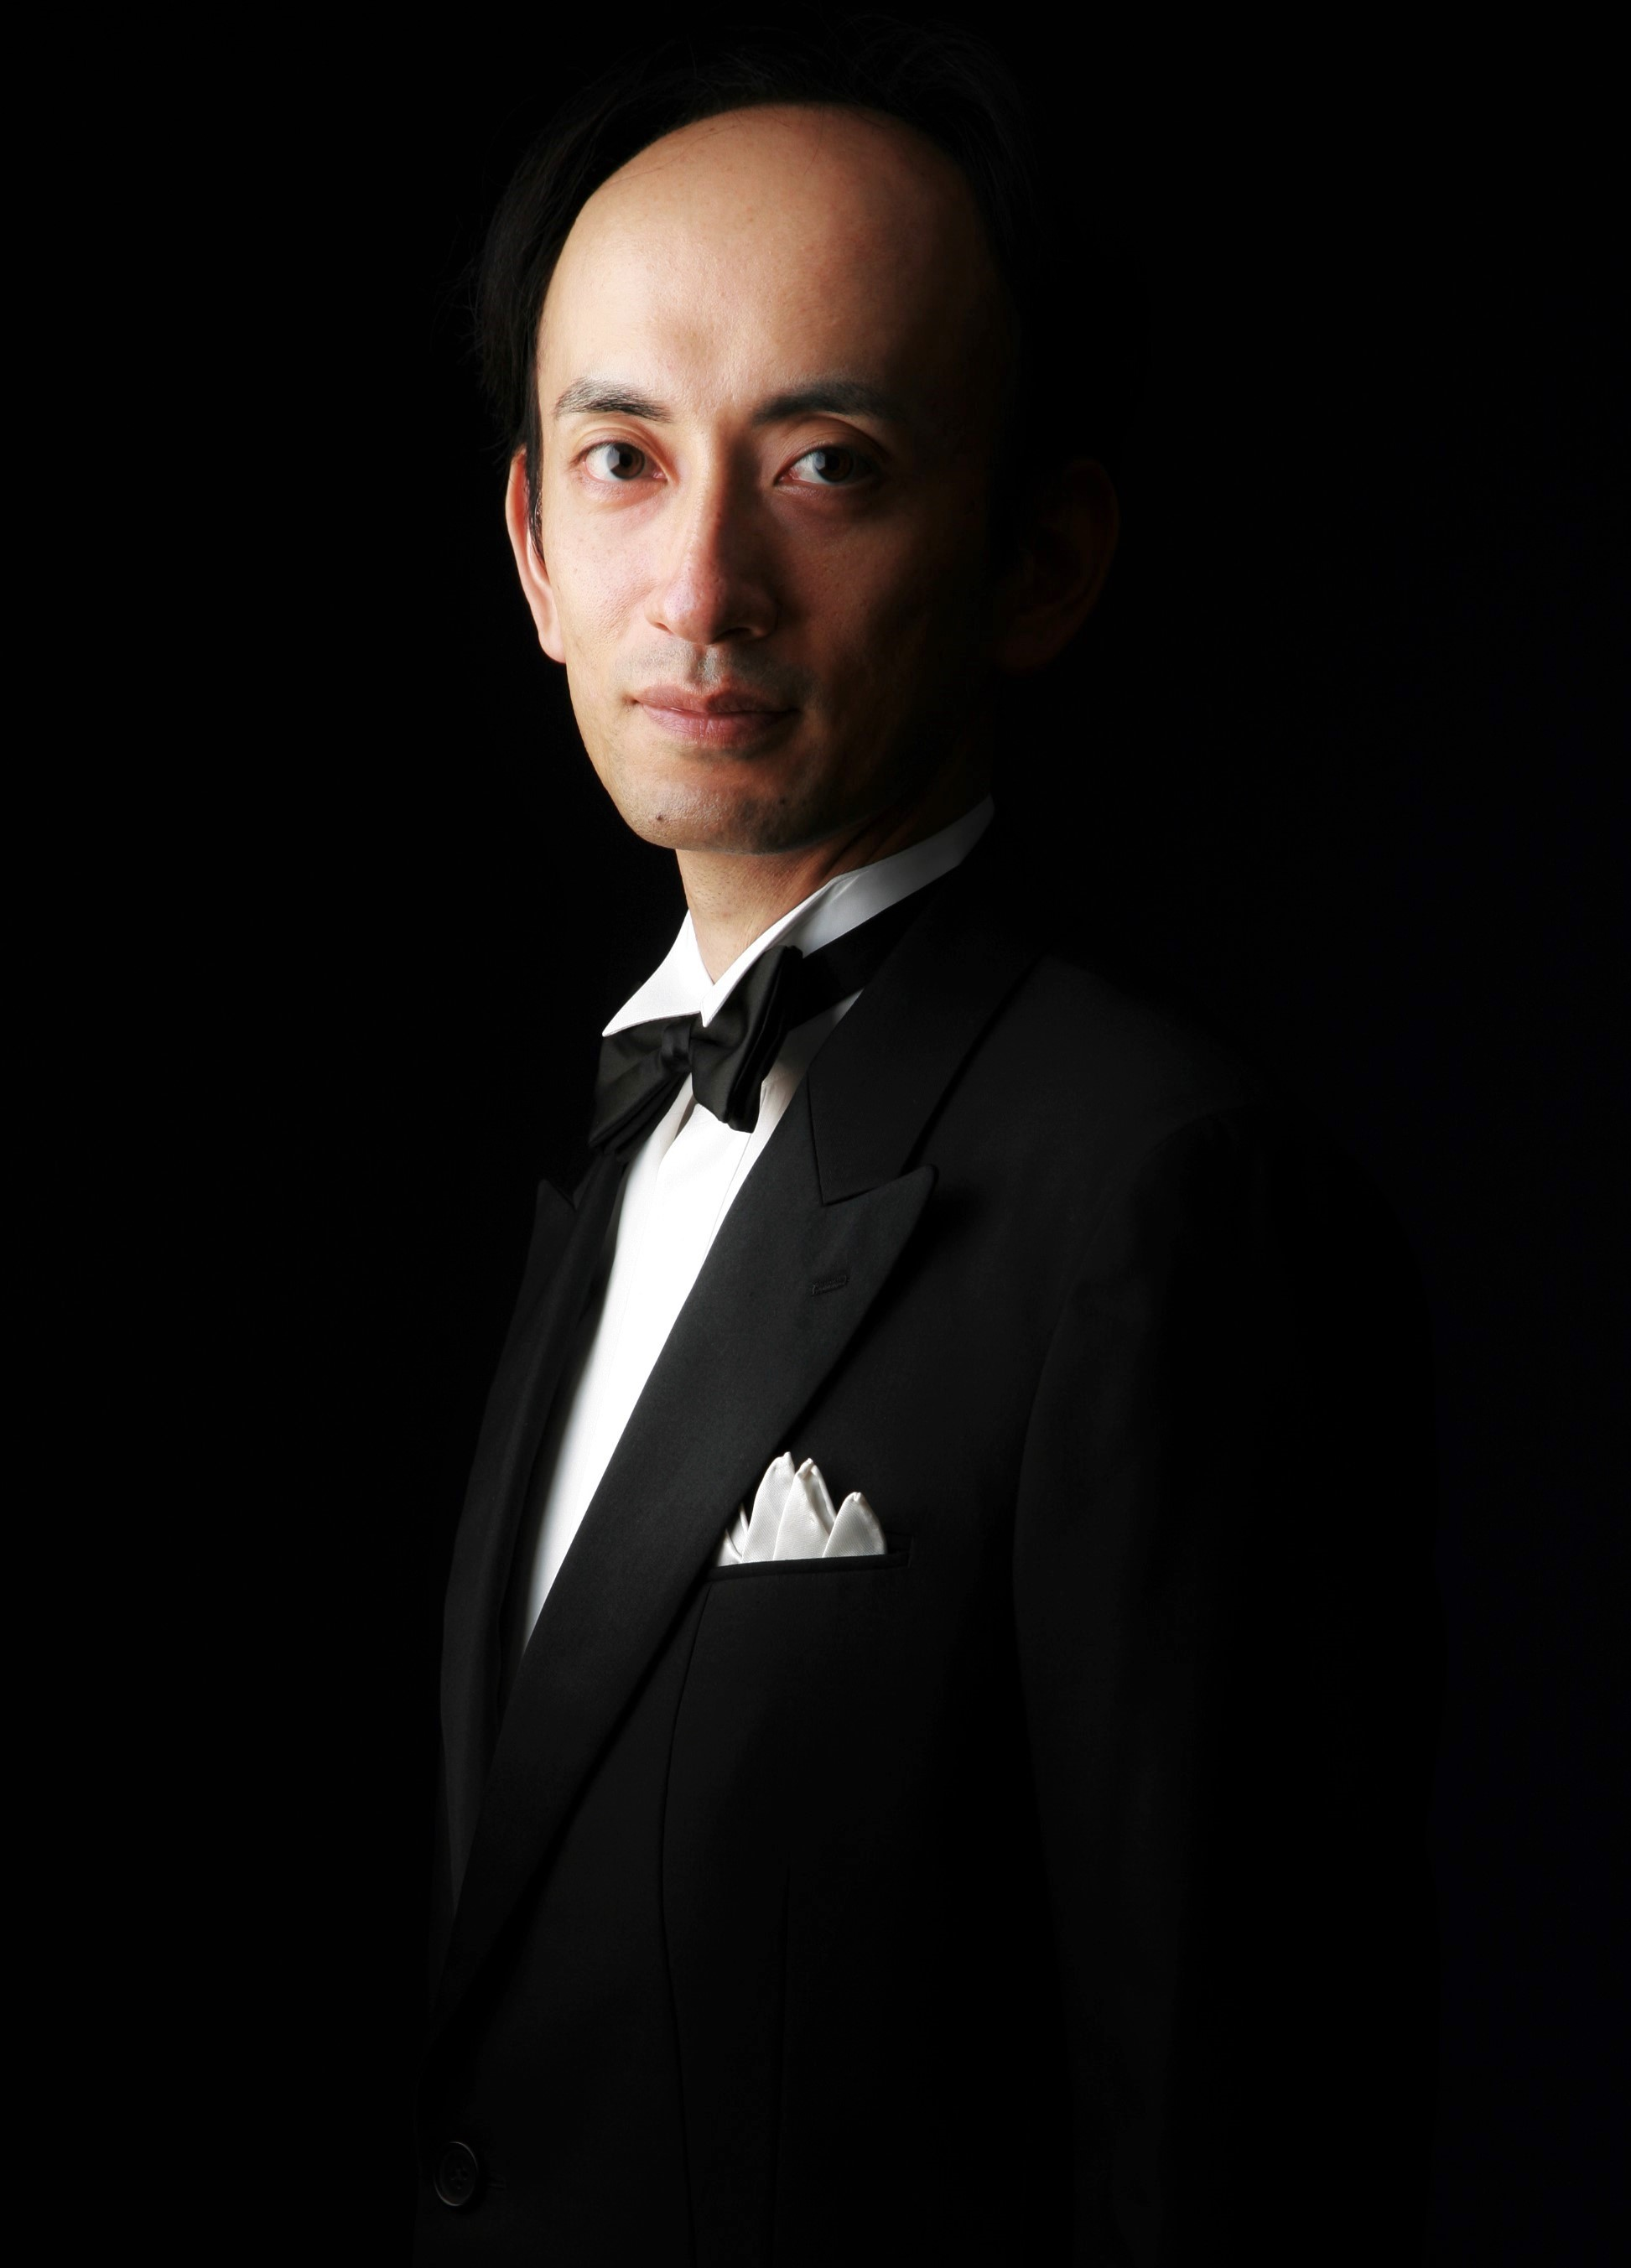 写真:NPO法人 札幌室内歌劇場メンバー 橋本卓三 (Bar)